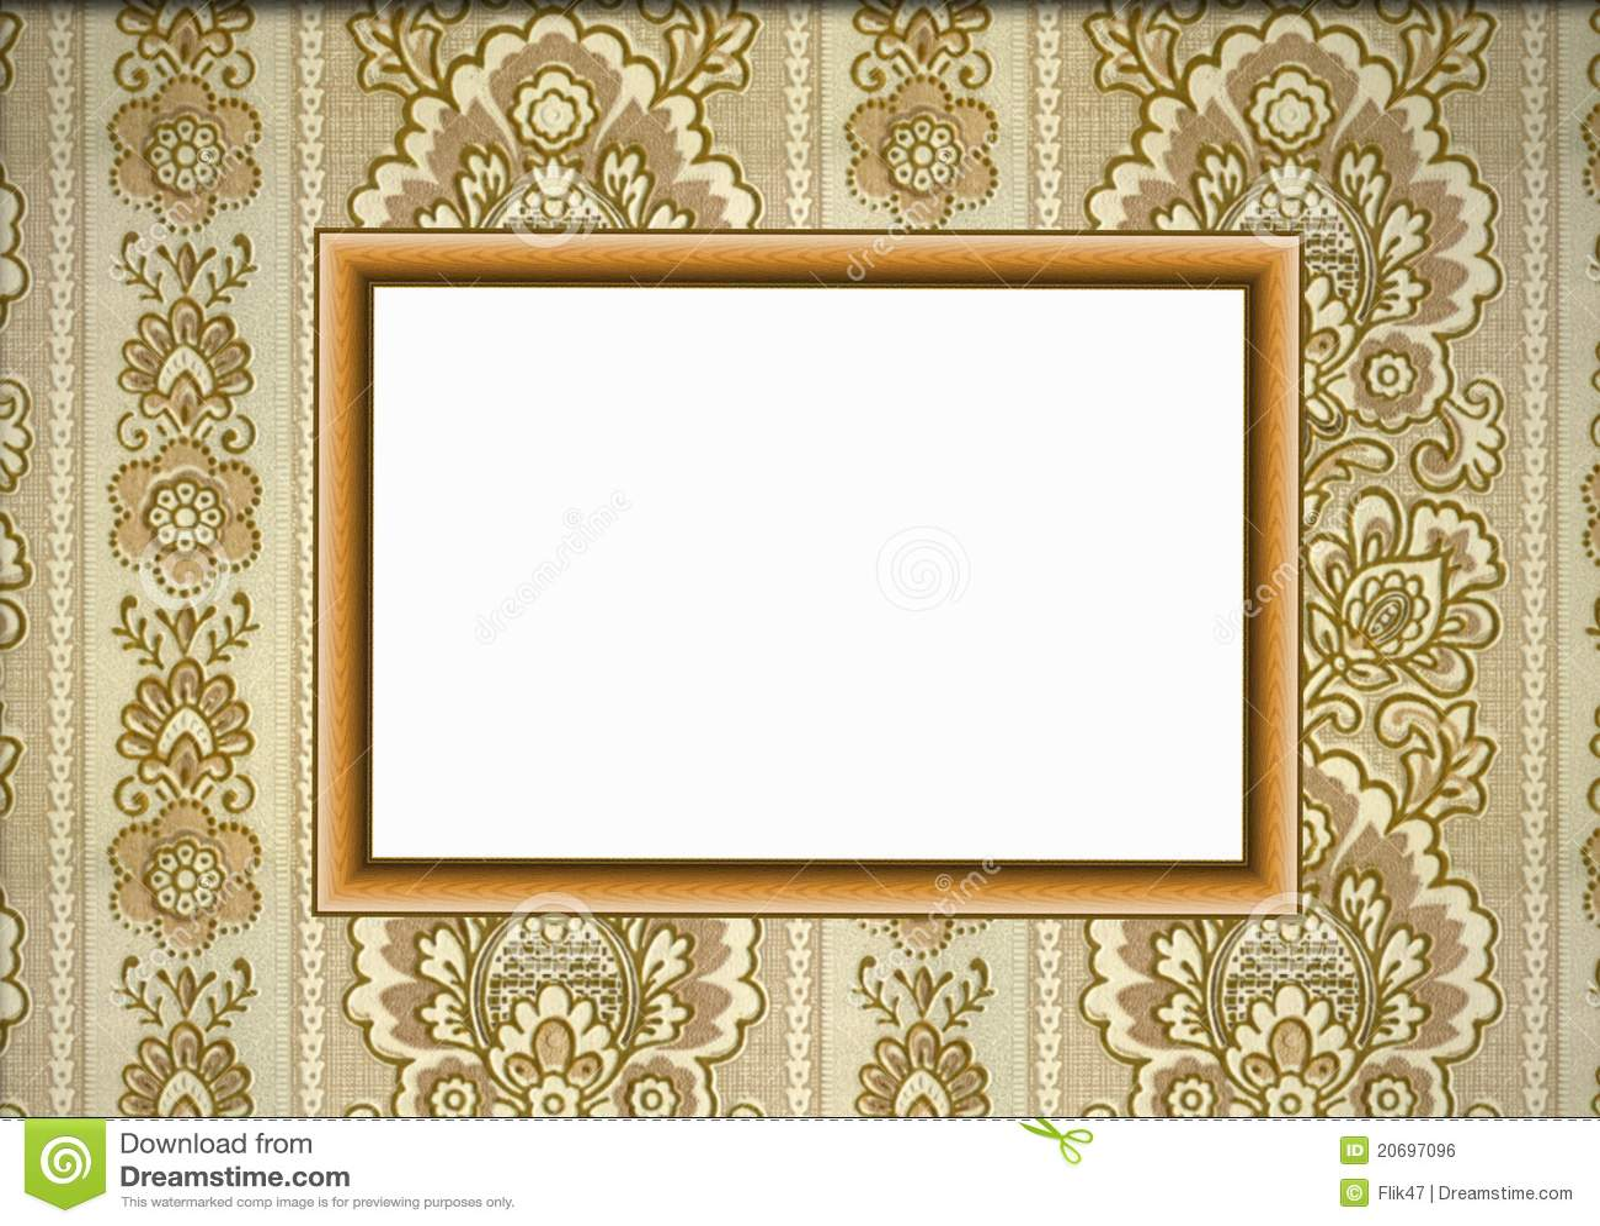 wooden frame on wallpaper royalty free stock image  image  - frame wallpaper